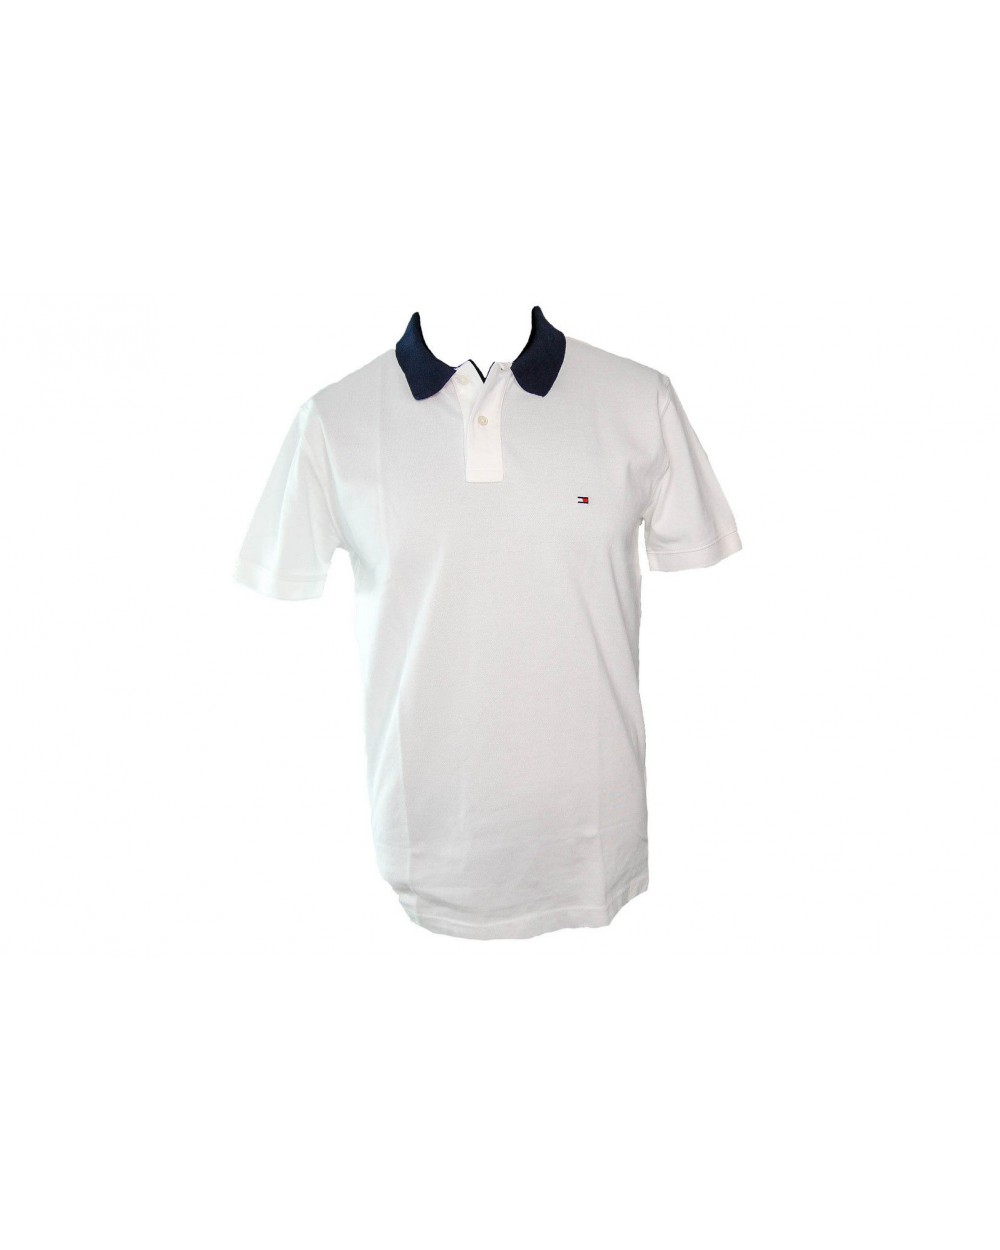 d5efe6d28e8fd Koszulka Polo TOMMY HILFIGER- MW0MW09735 100 biała